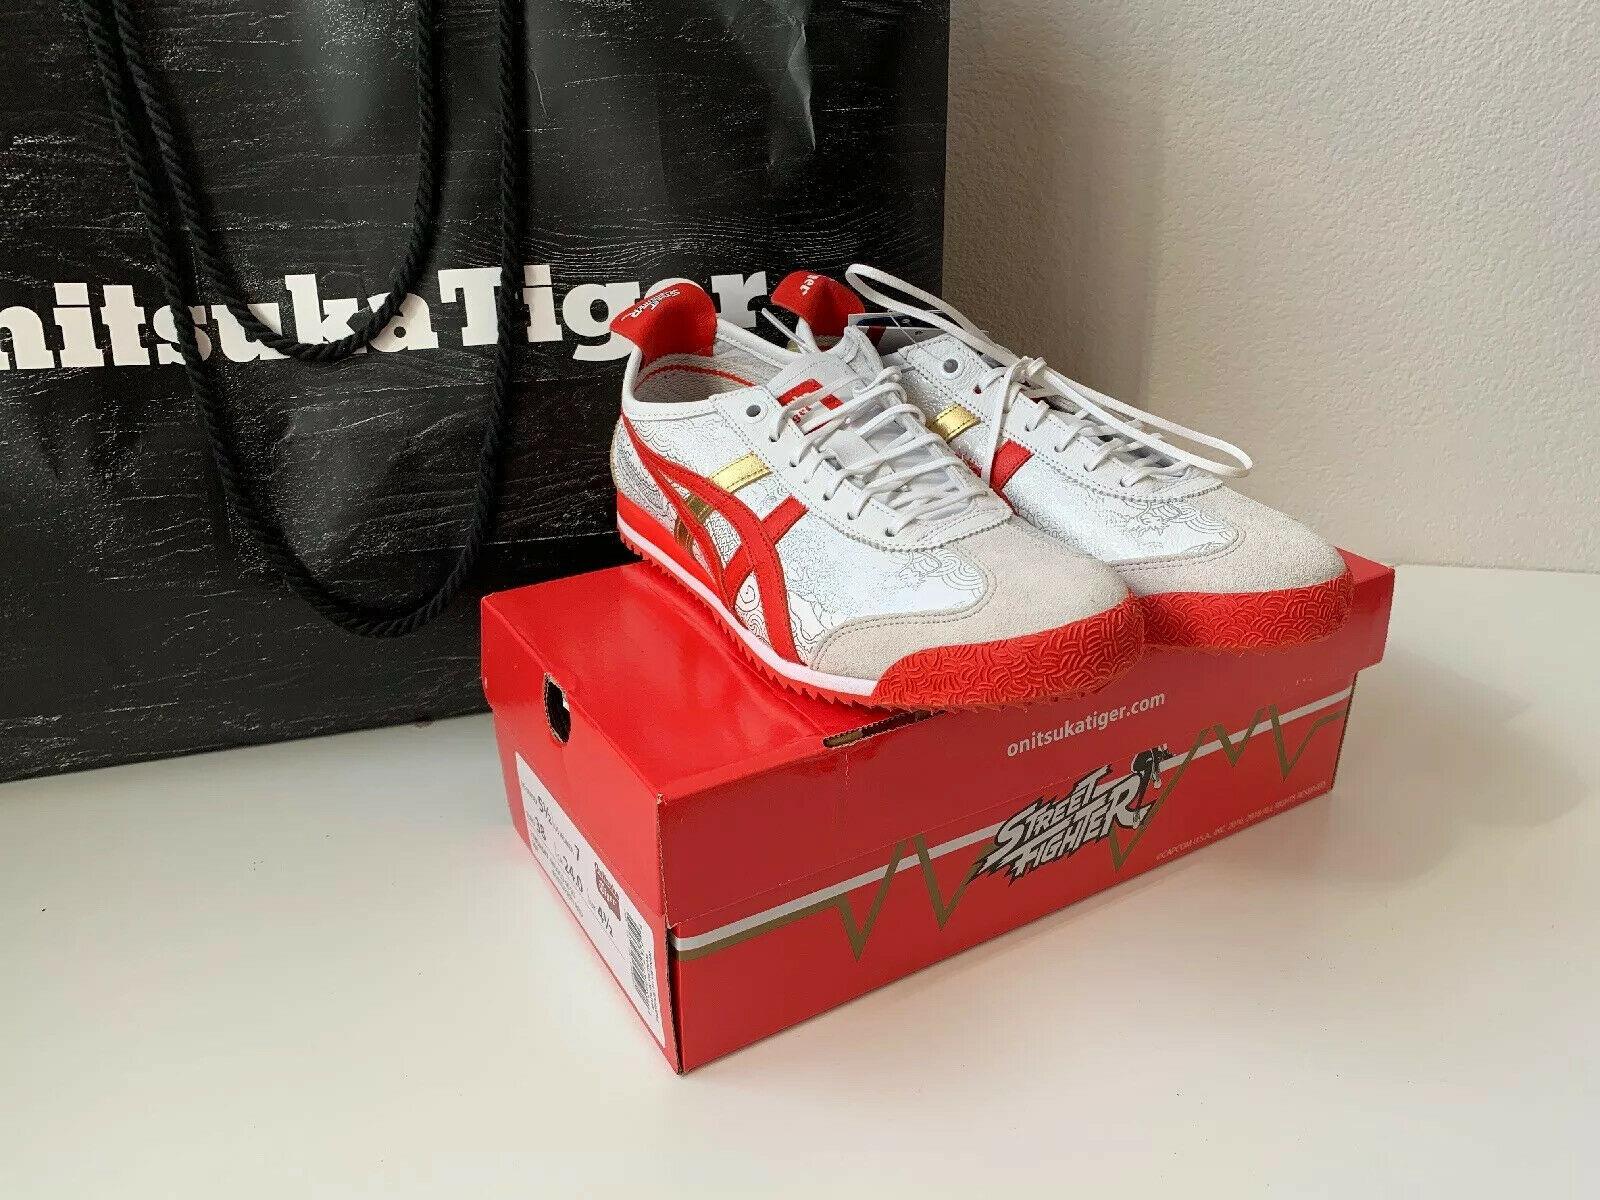 ASICS Onitsuka Tiger Street Fighter Chun Li Shoes Sneakers Red NIB Size 7